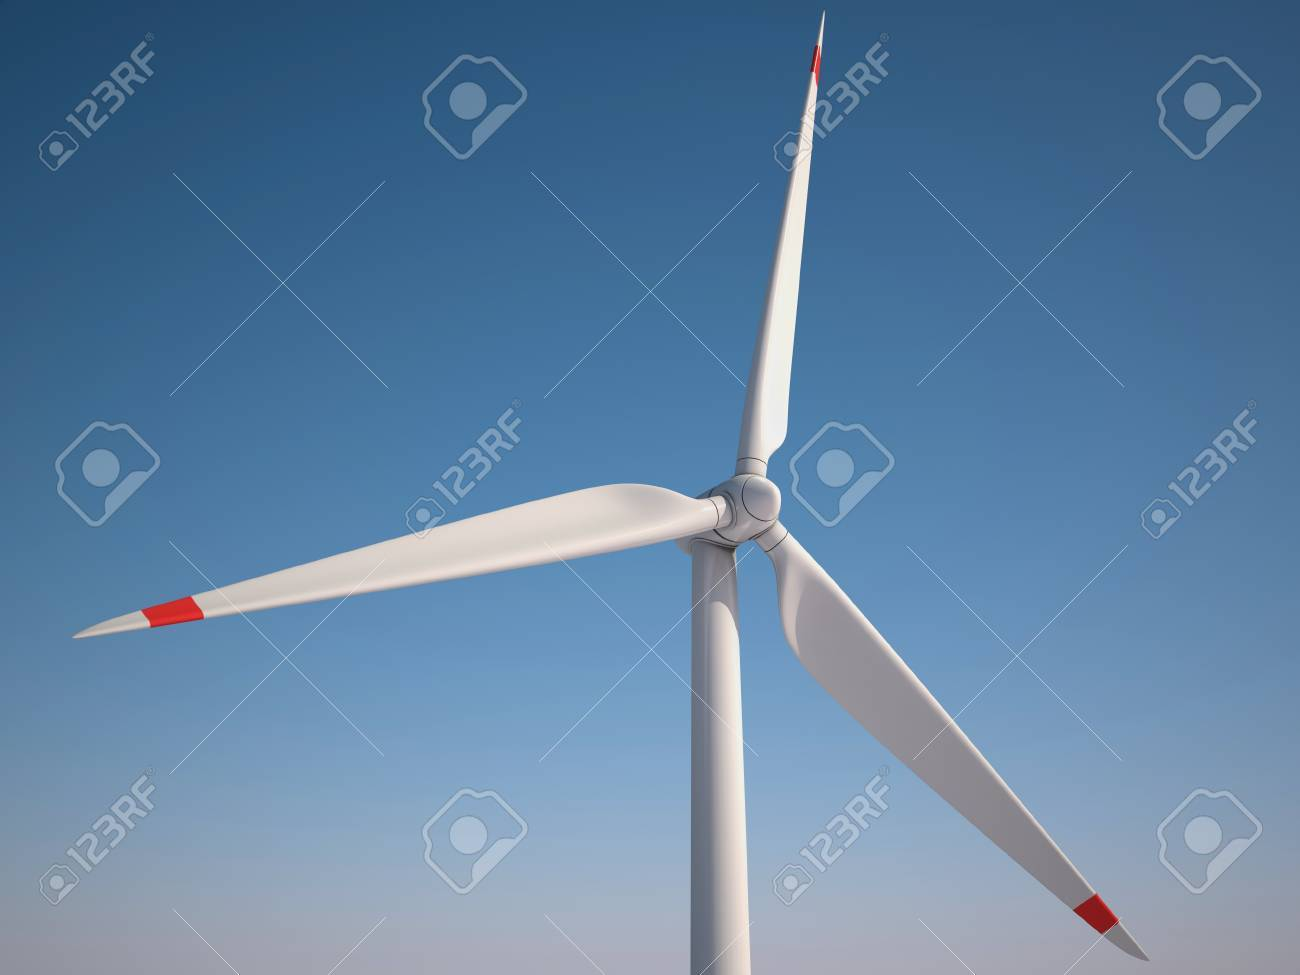 Wind power station against the blue sky - Power generation wind turbines - alternative energy 3d concept Standard-Bild - 12557850